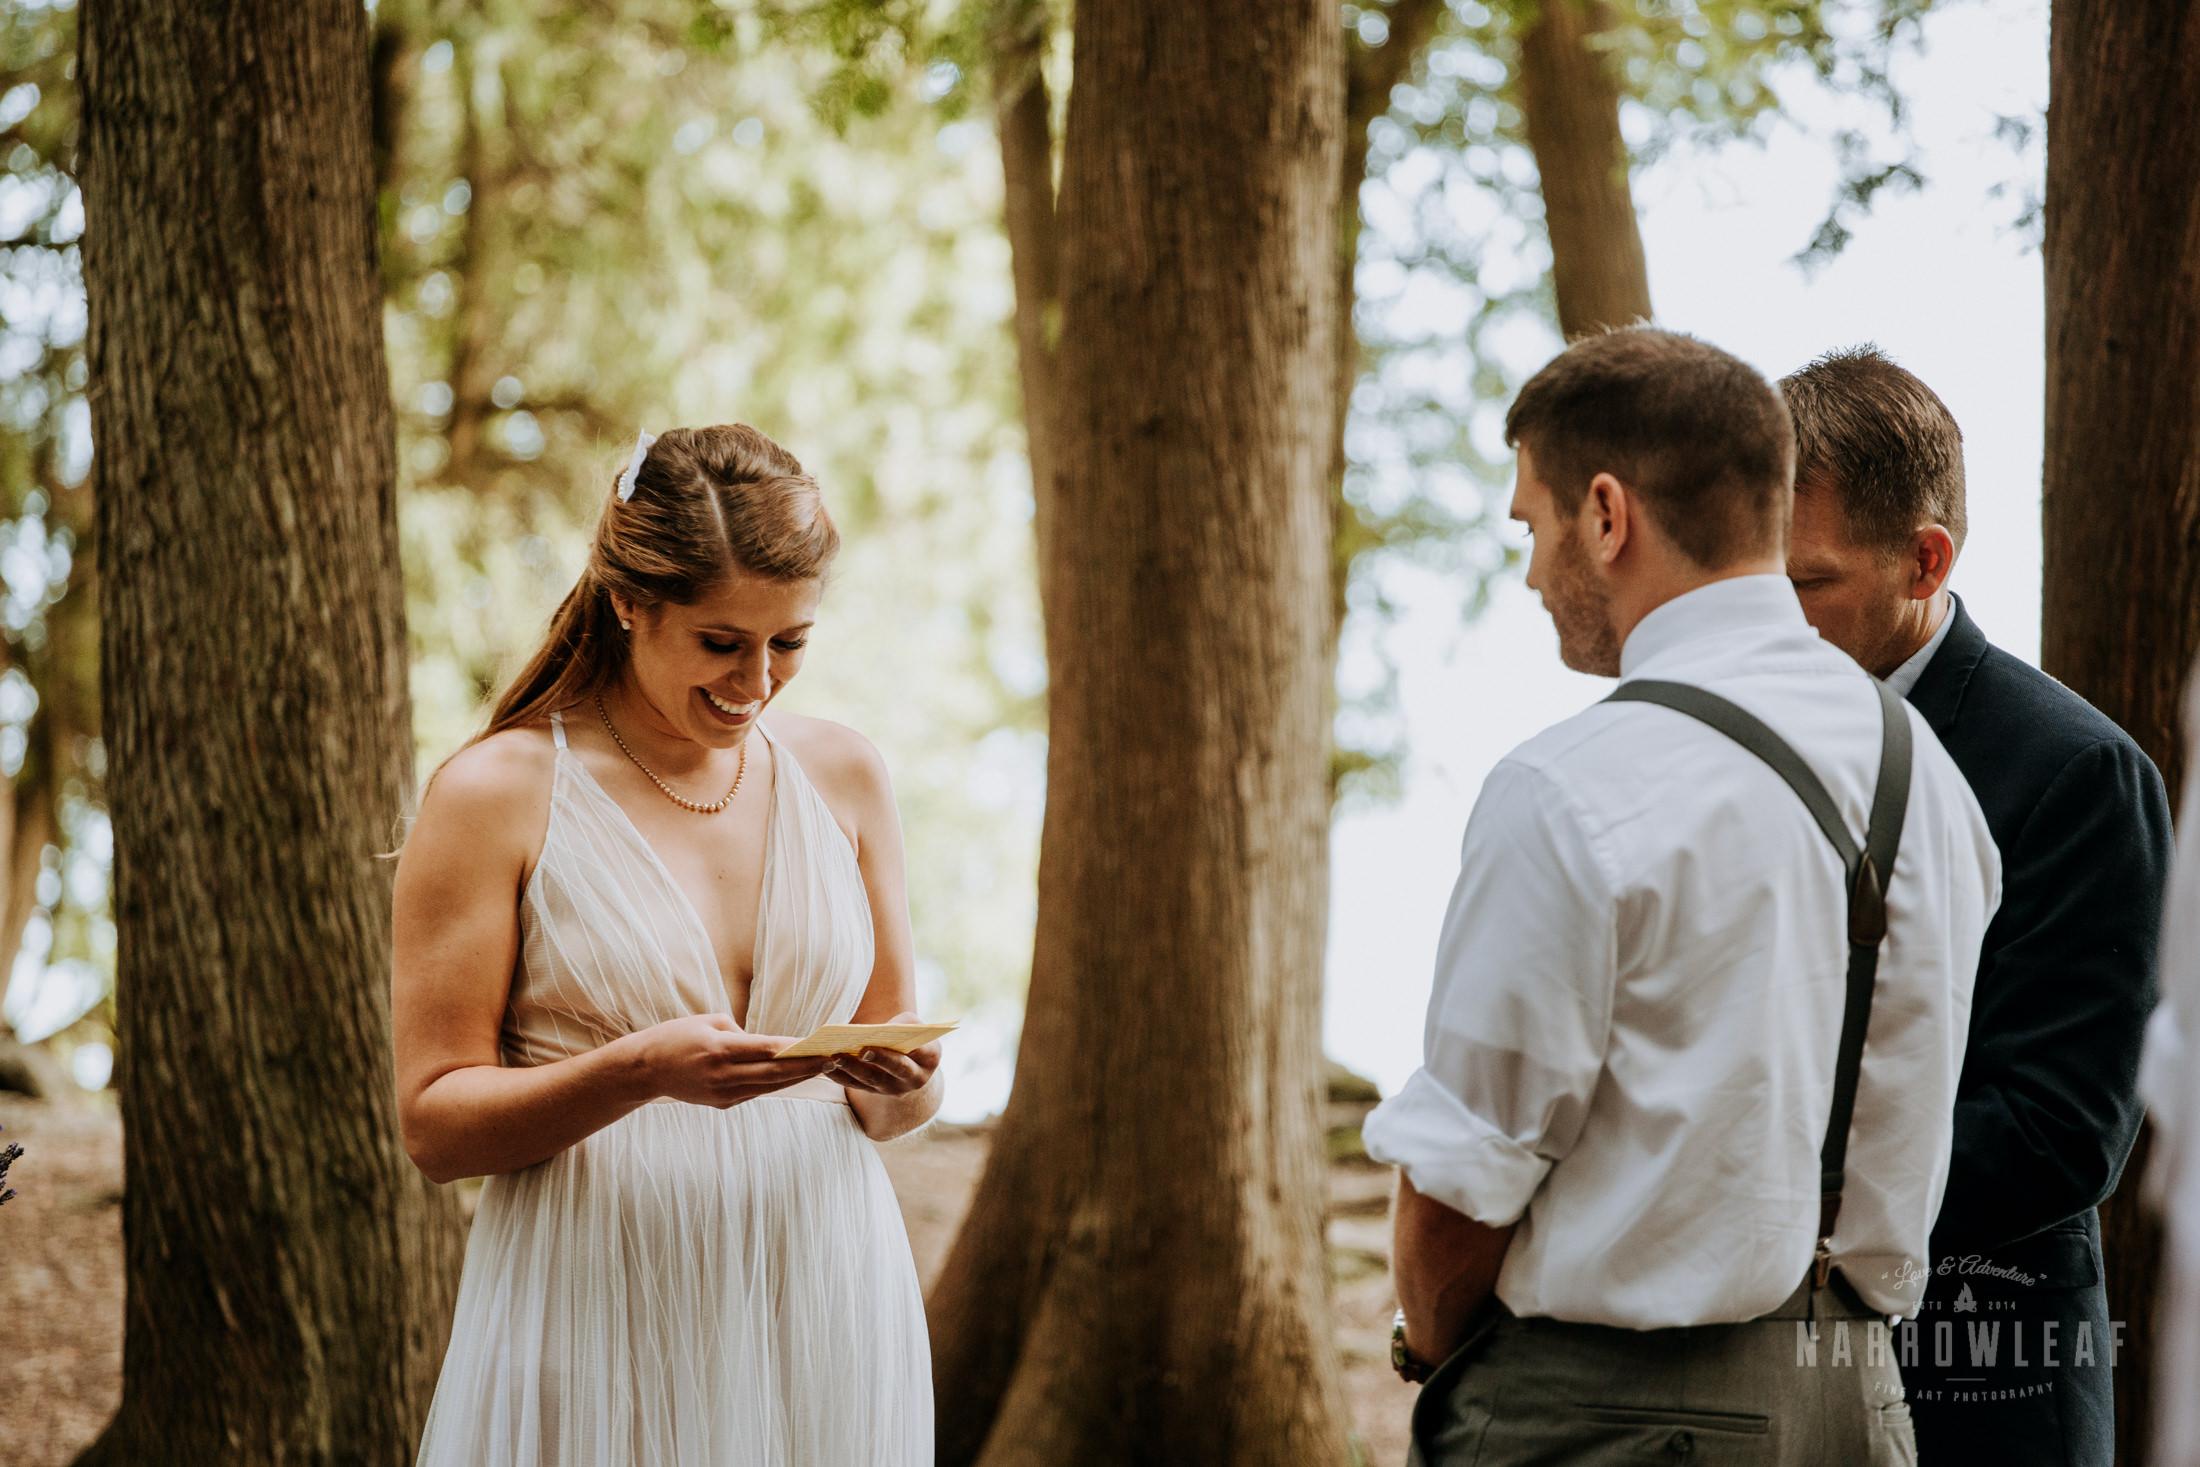 door-county-wedding-photographer-in-the-woods-Narrowleaf_Love_and_Adventure_Photography-8092.jpg